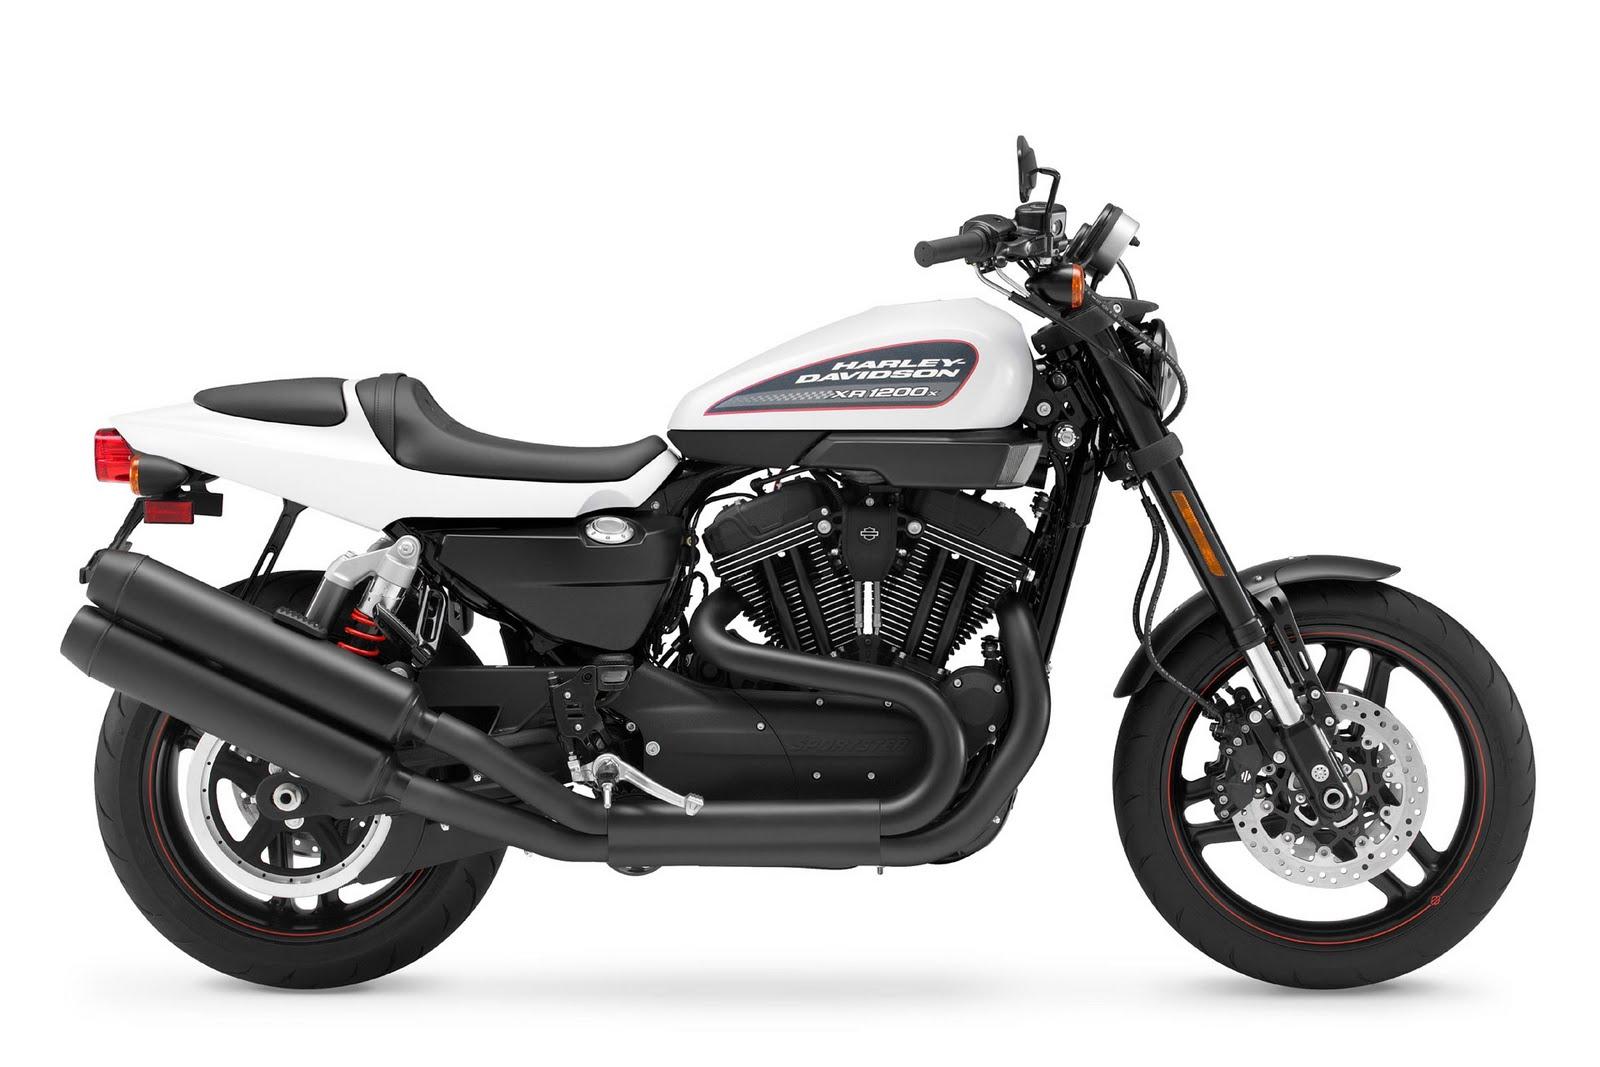 http://1.bp.blogspot.com/_J3_liDBfbvs/TBWvtrofMmI/AAAAAAAAtd8/AtLUMTtBfVQ/s1600/2011-Harley-Davidson-XR1200X-Wallpaper.jpg